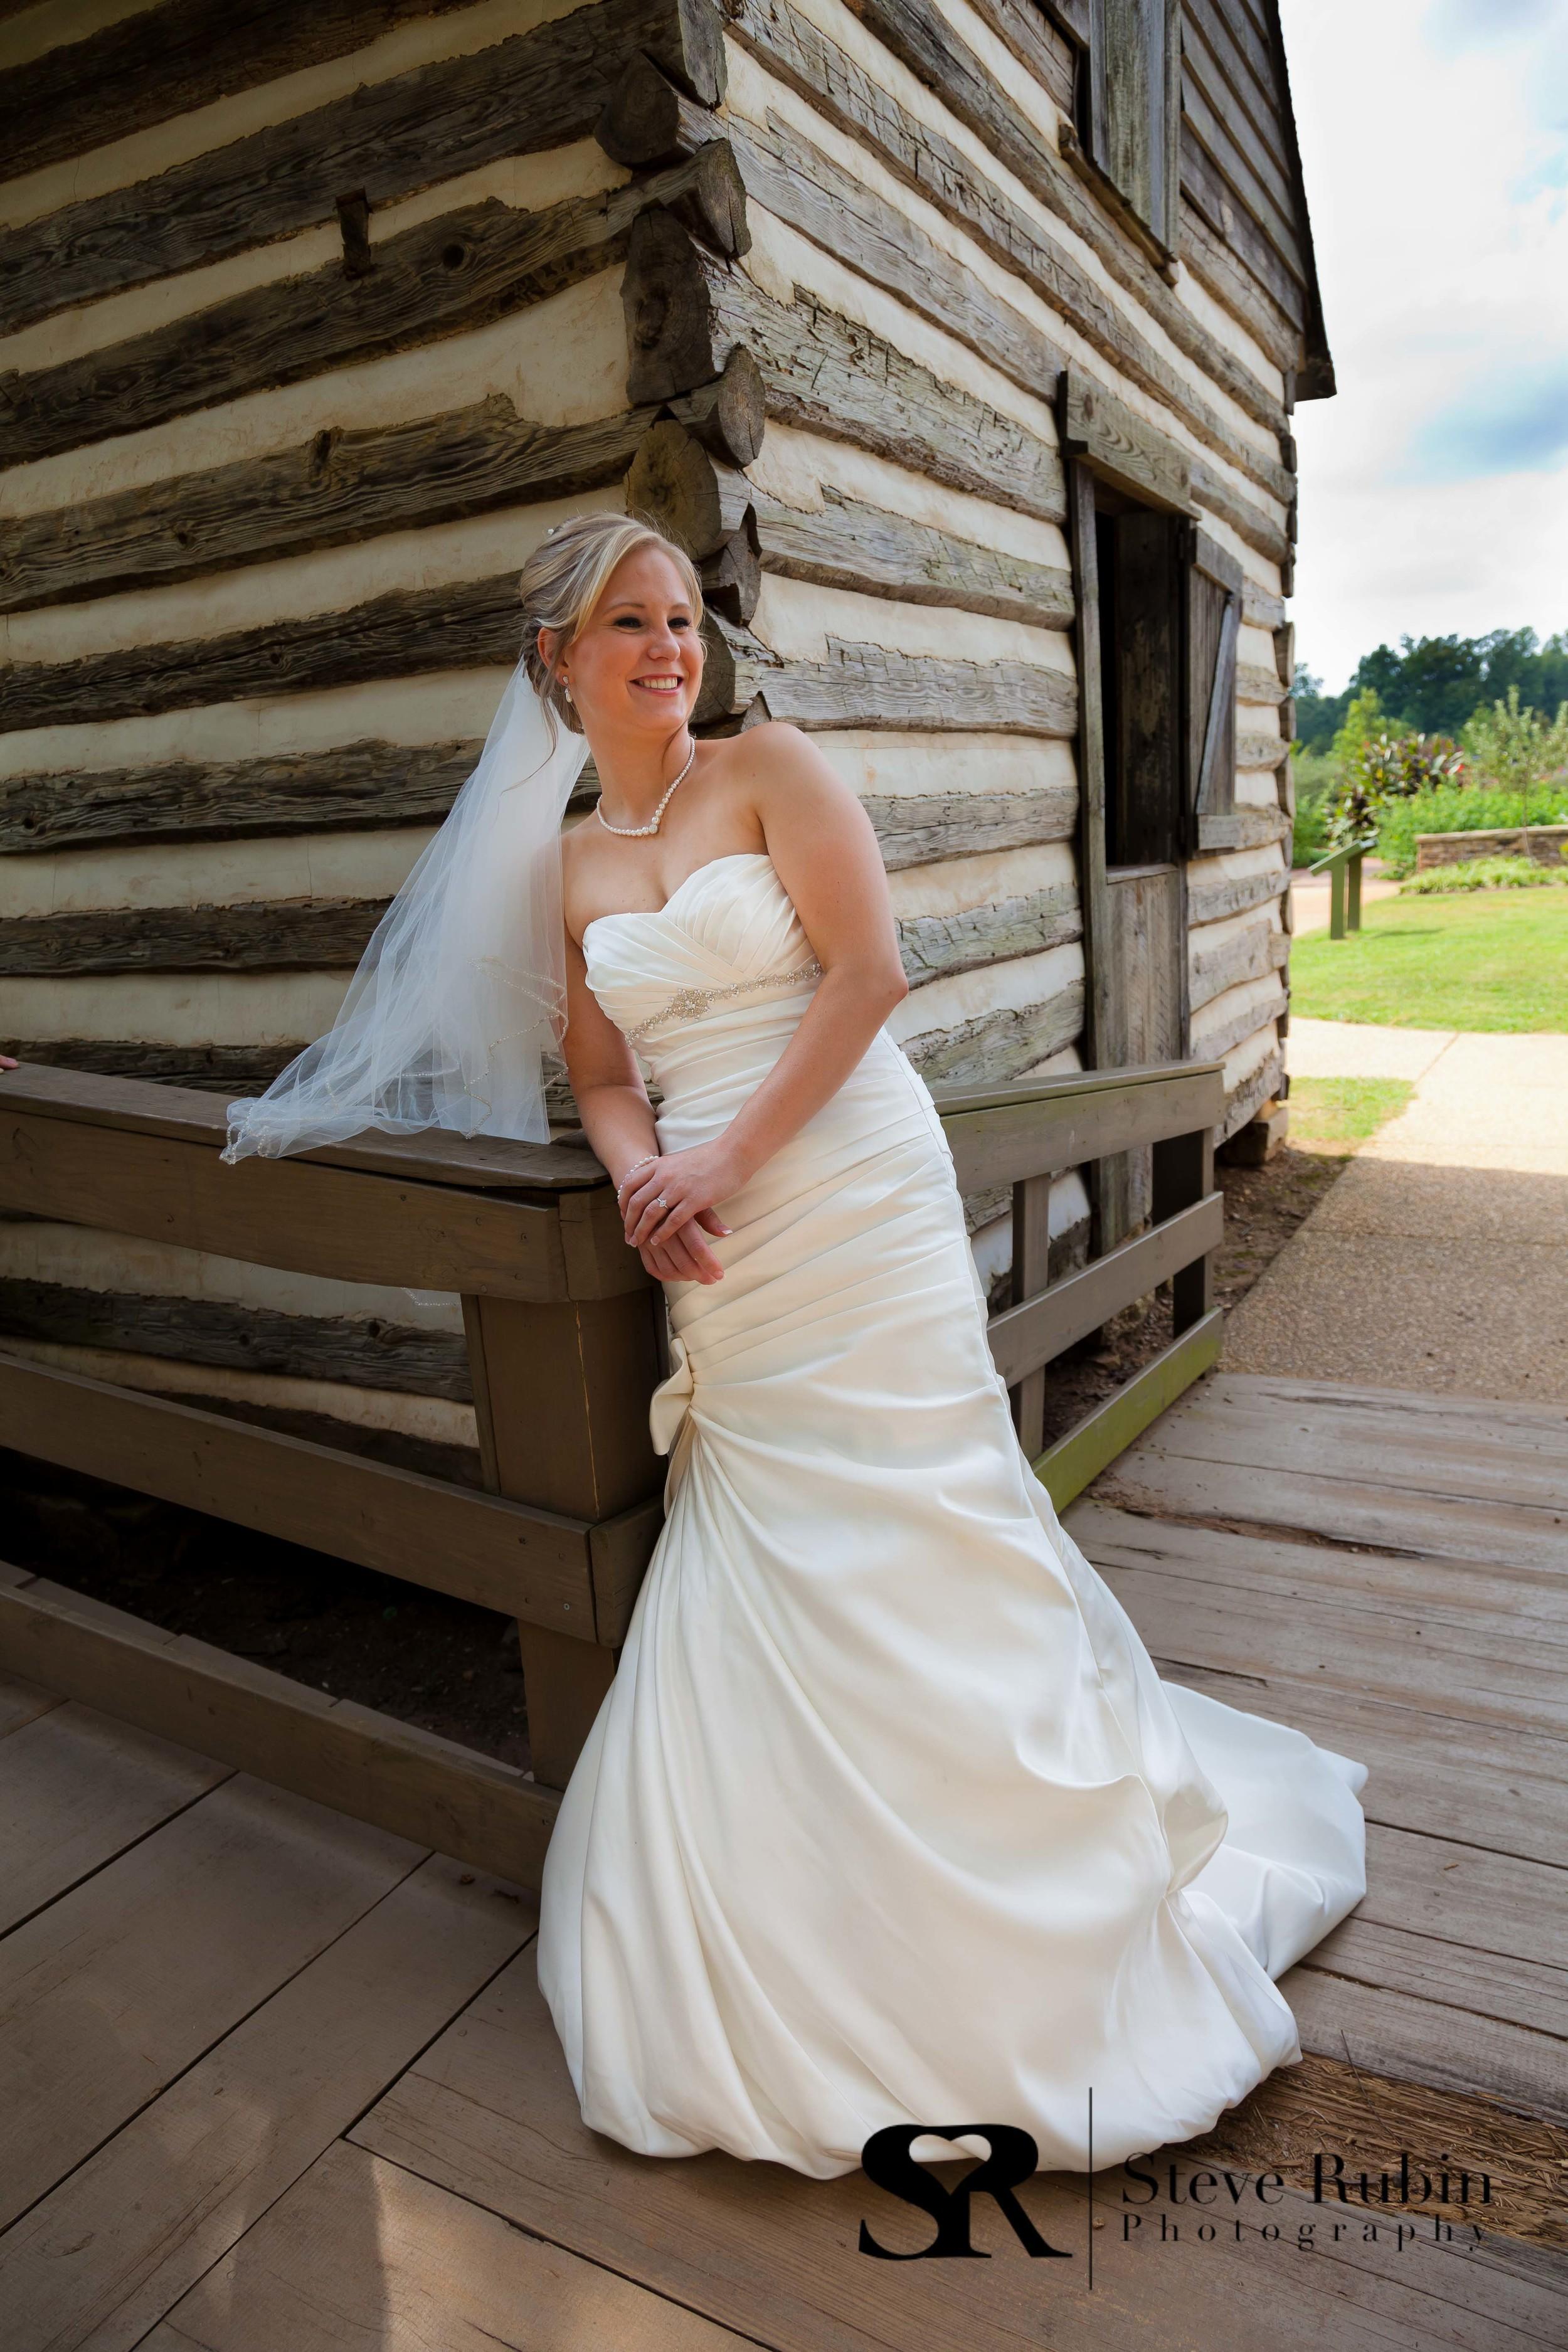 Bride outdoor Portrait with Barn at Joyner Park